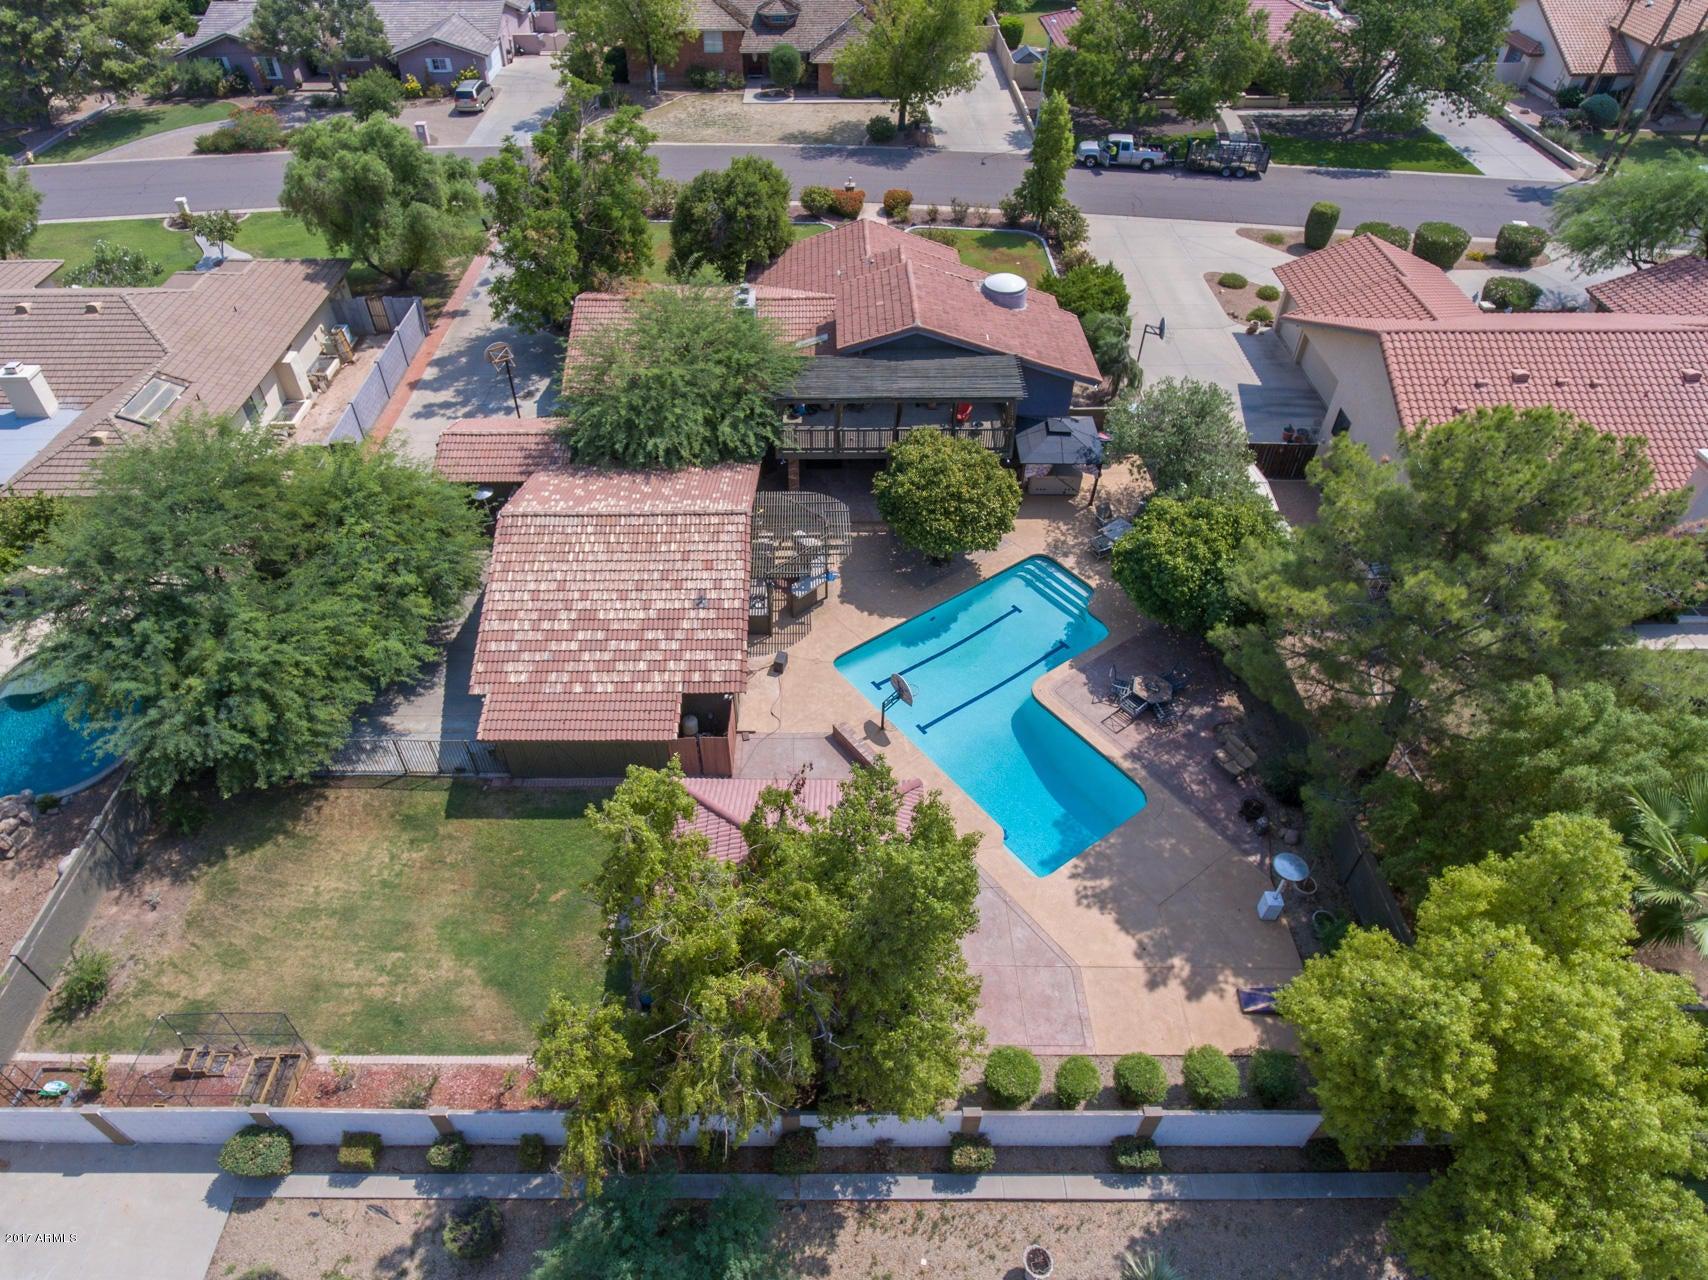 MLS 5662566 9504 S KENNETH Place, Tempe, AZ 85284 Tempe AZ Mountain View